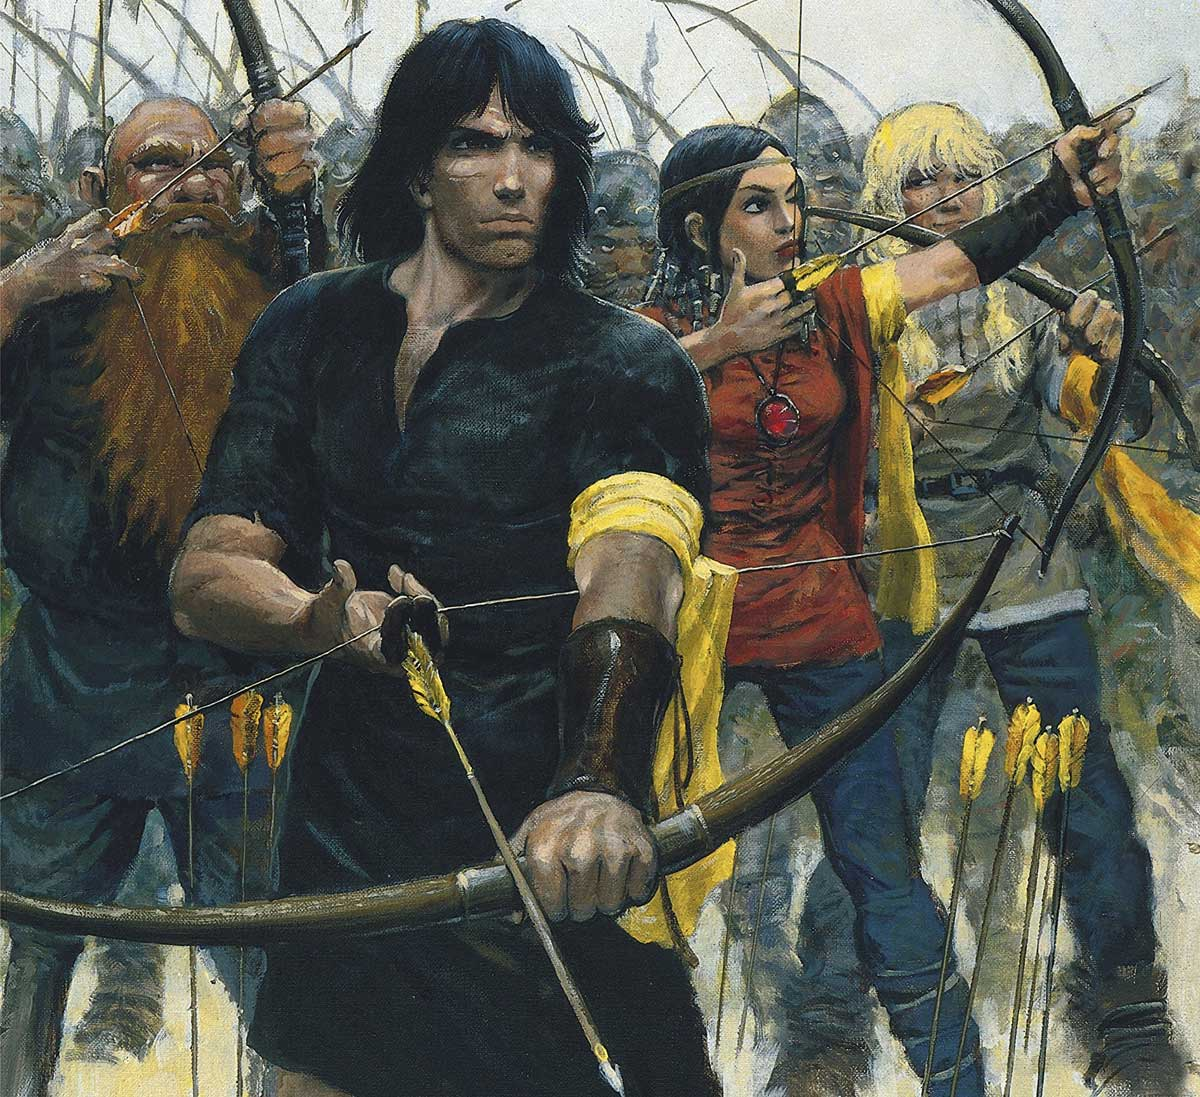 Golem-comics-resena-Thorgal-van-hamme-rosinski-07